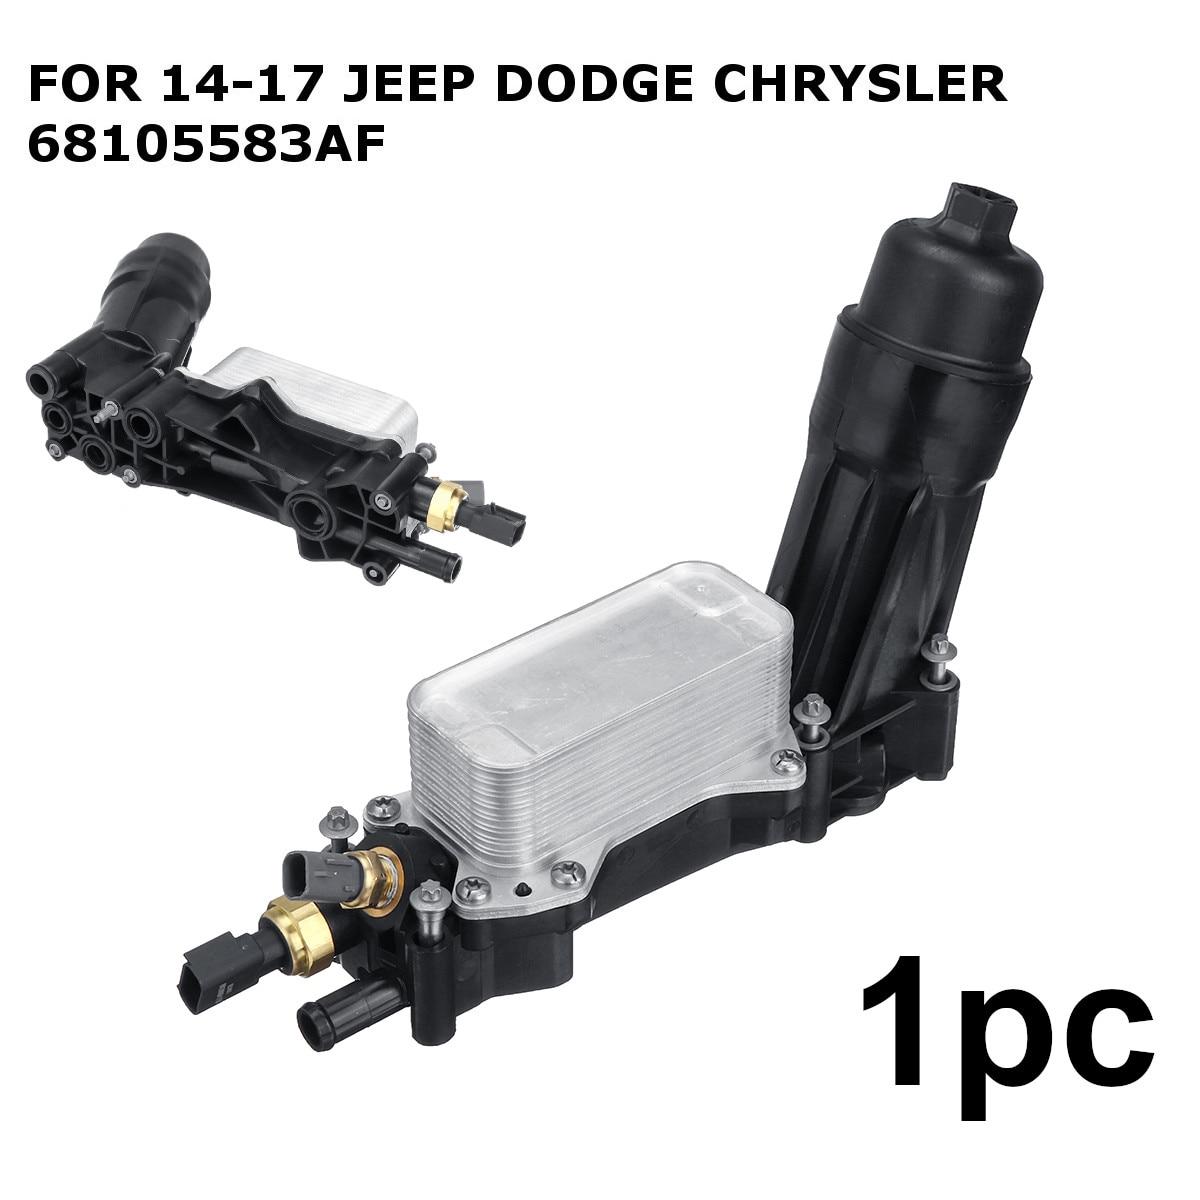 Car Engine Oil Filter Adapter Housing For Jeep for Dodge Chrysler 3 6 V6 2014 2015